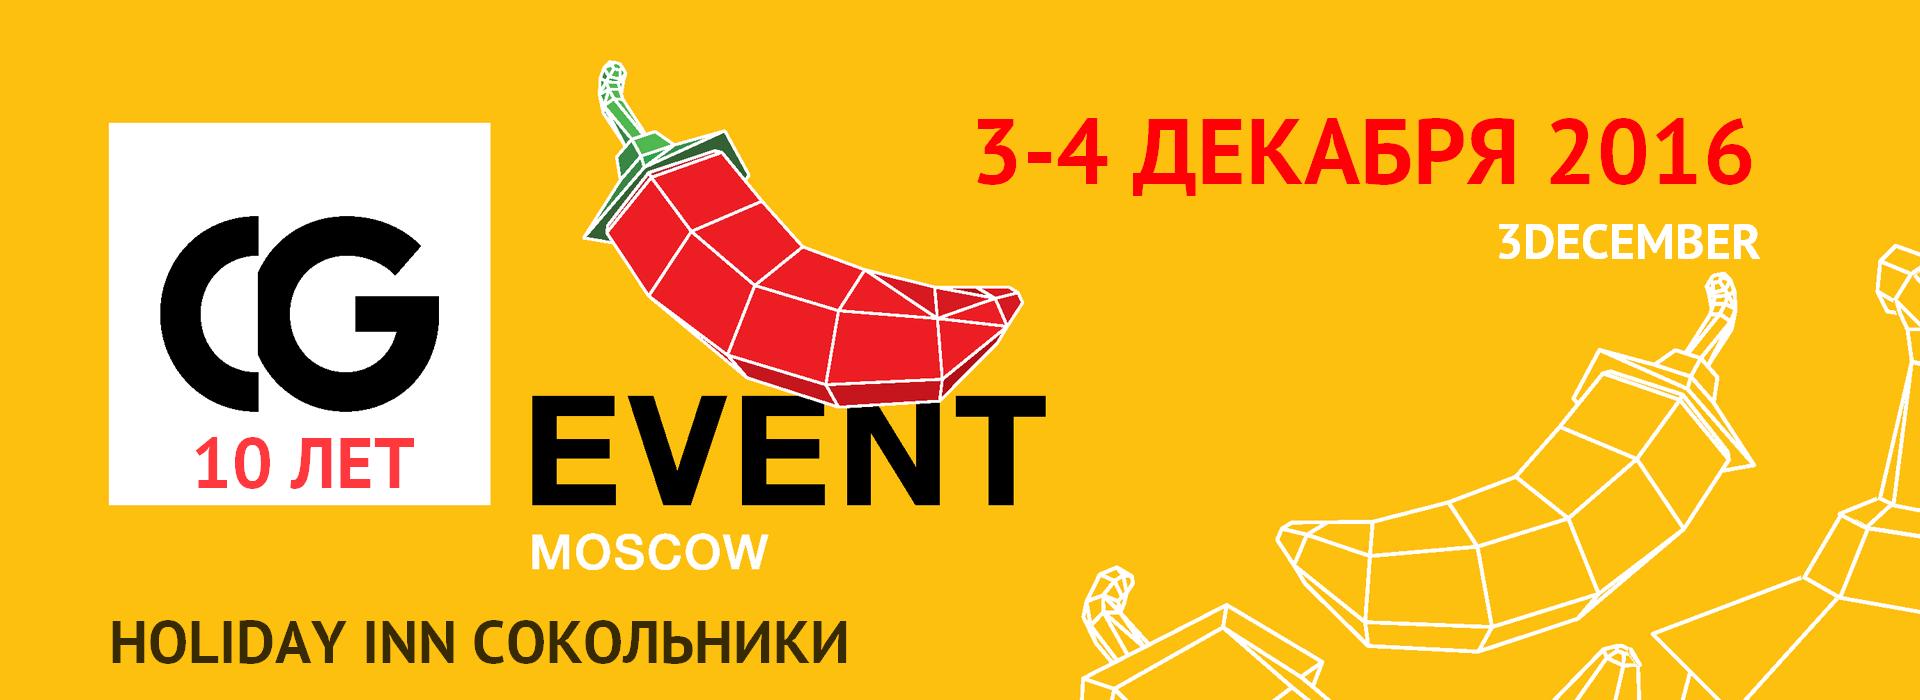 banner2016_1